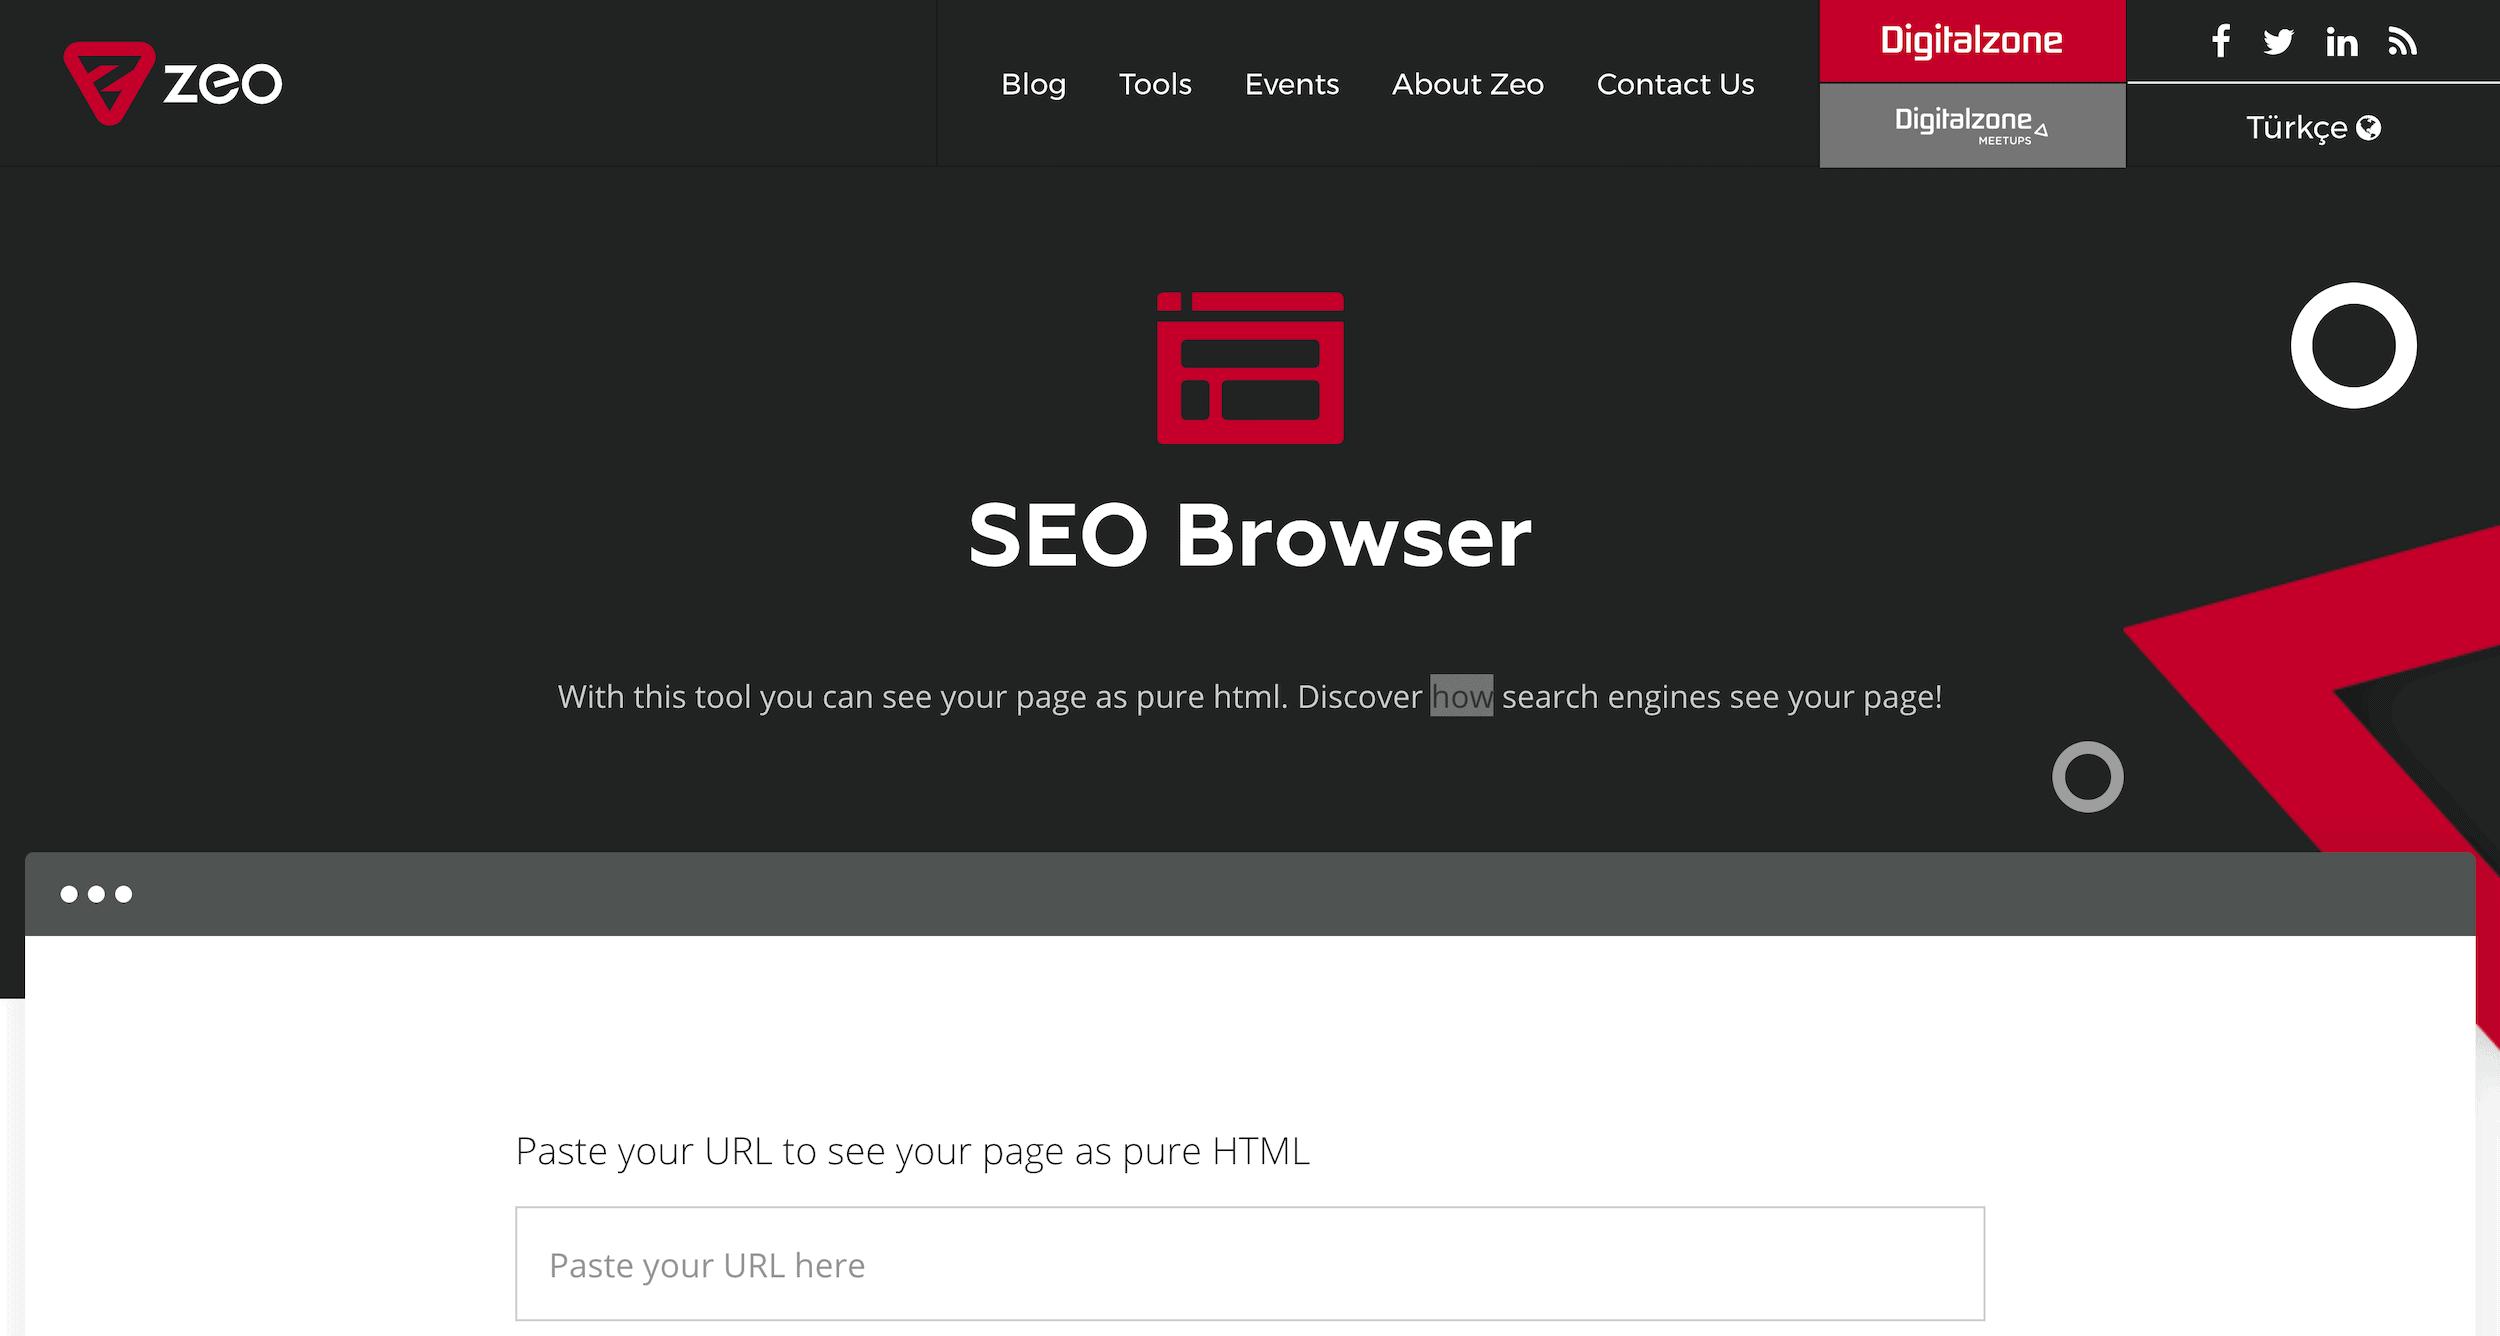 ZEO SEO browser